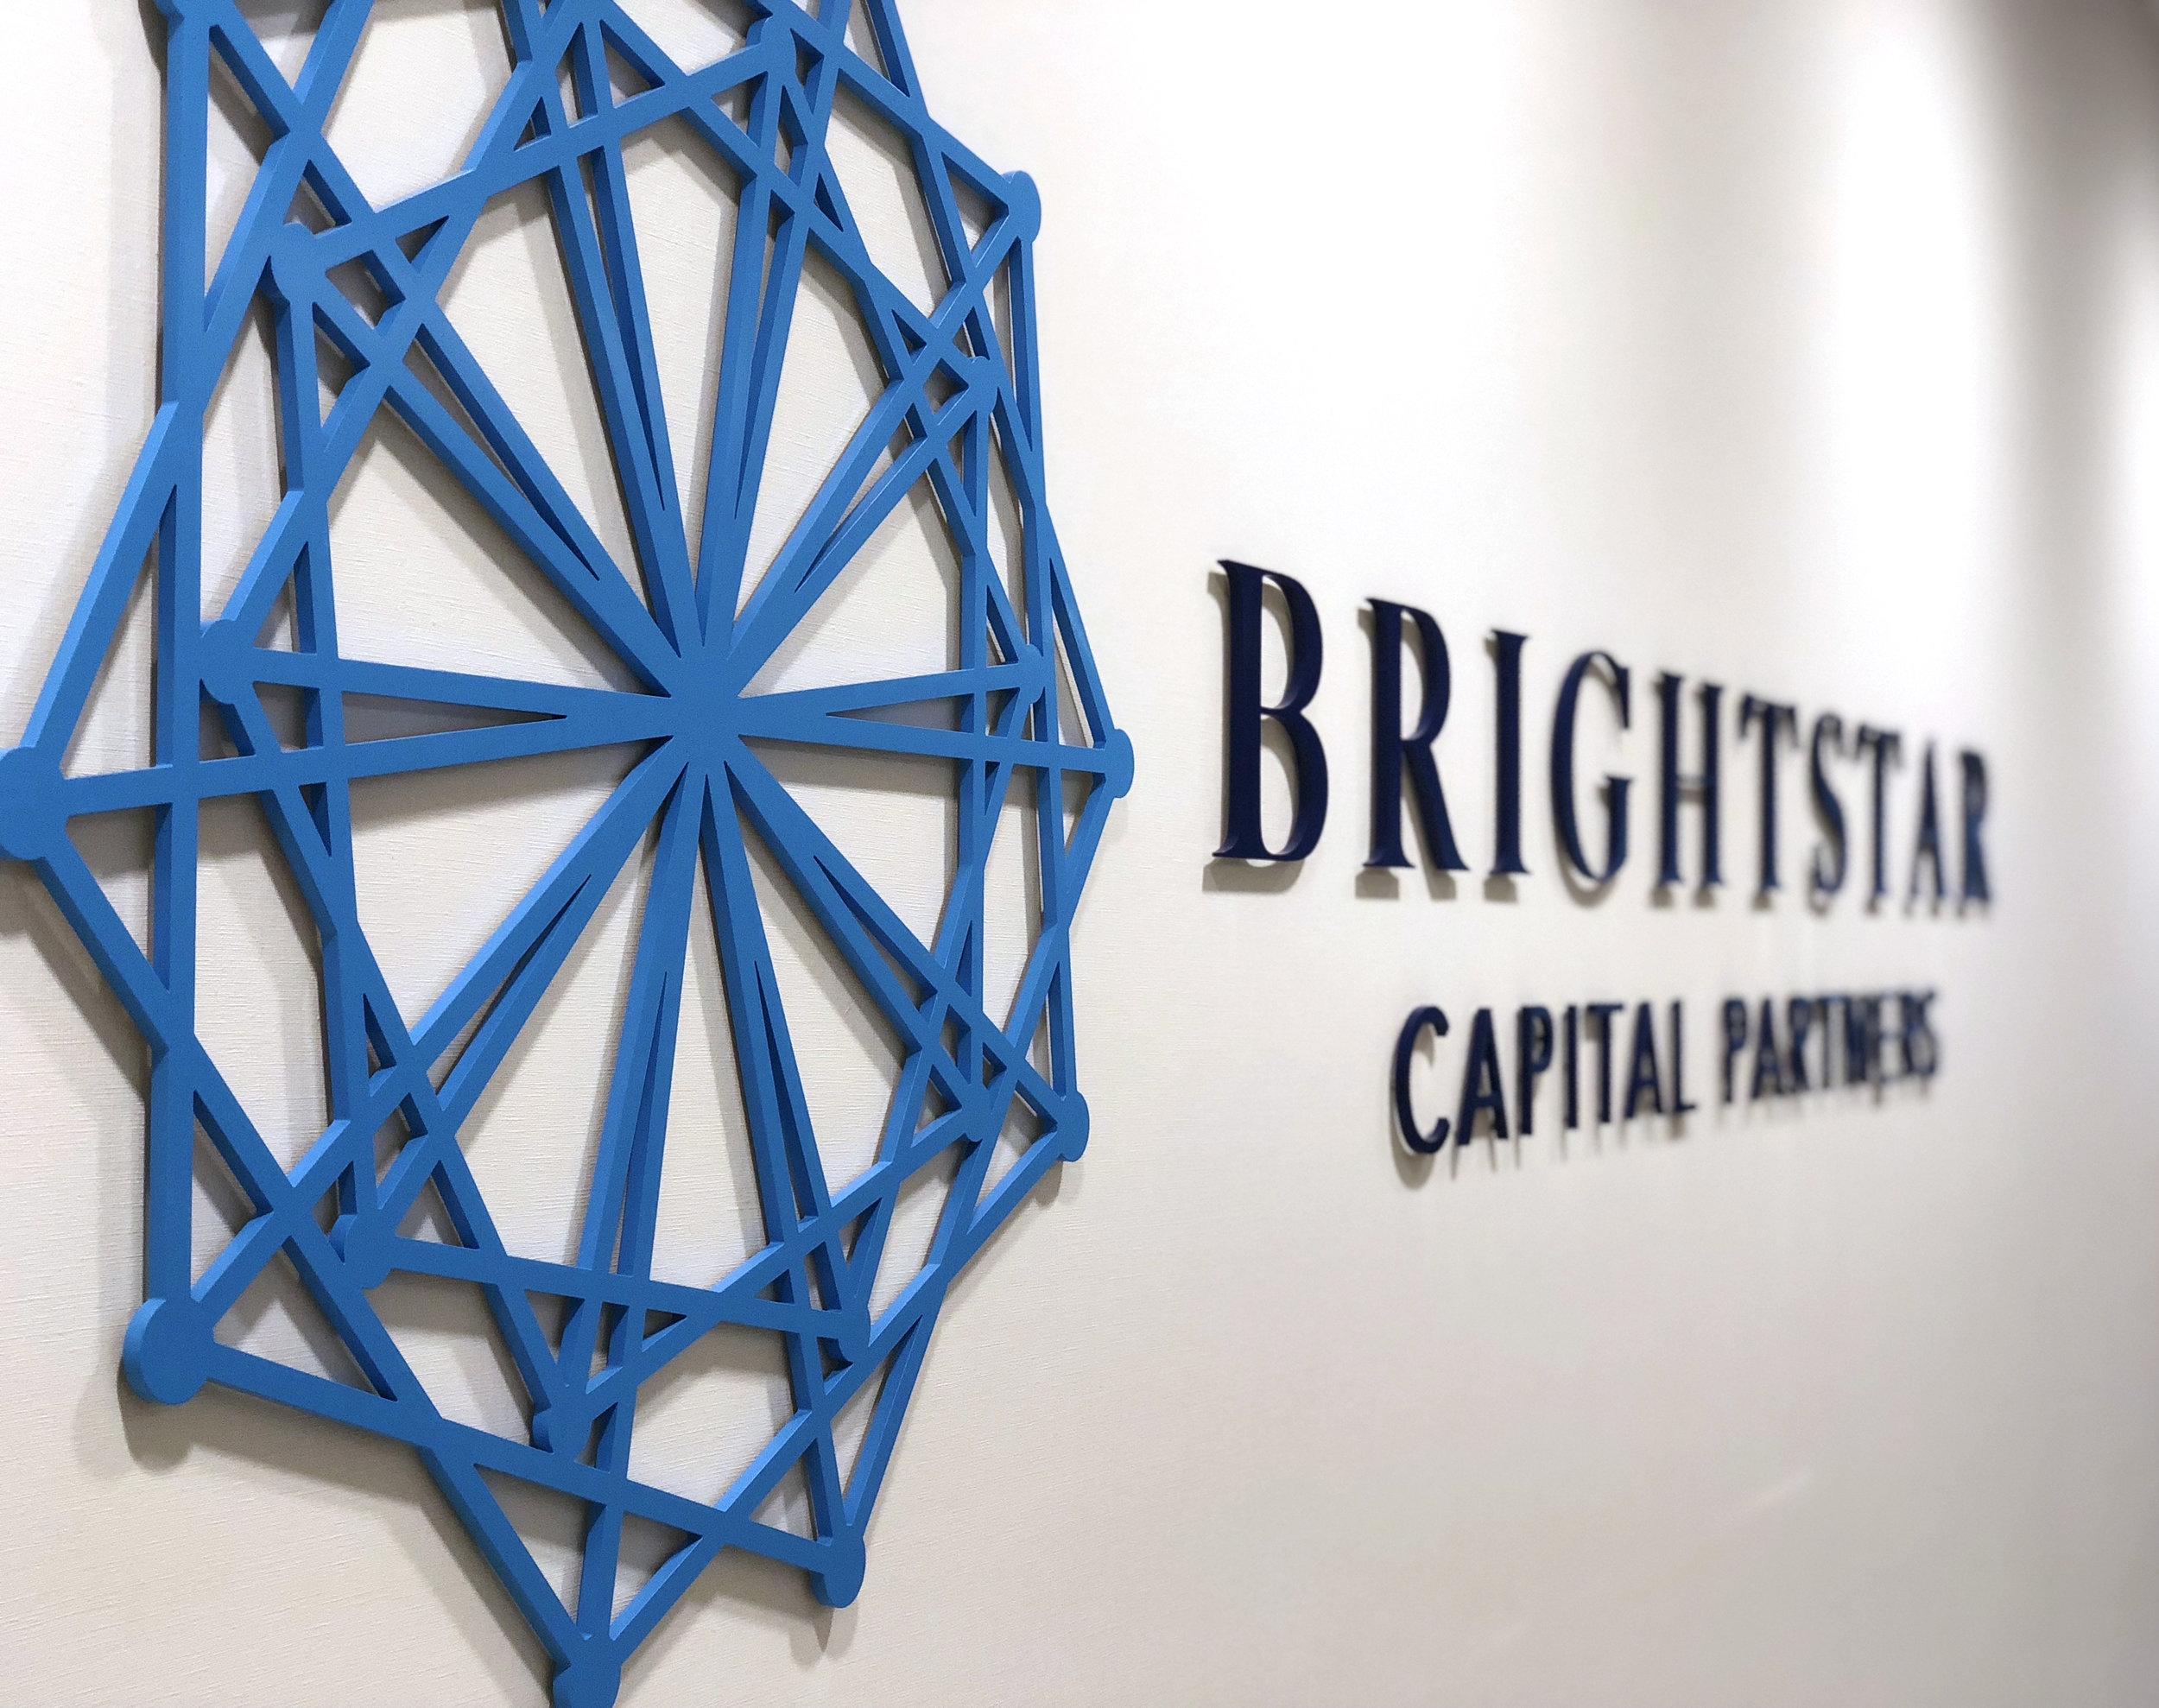 Brightstar Capital Partners